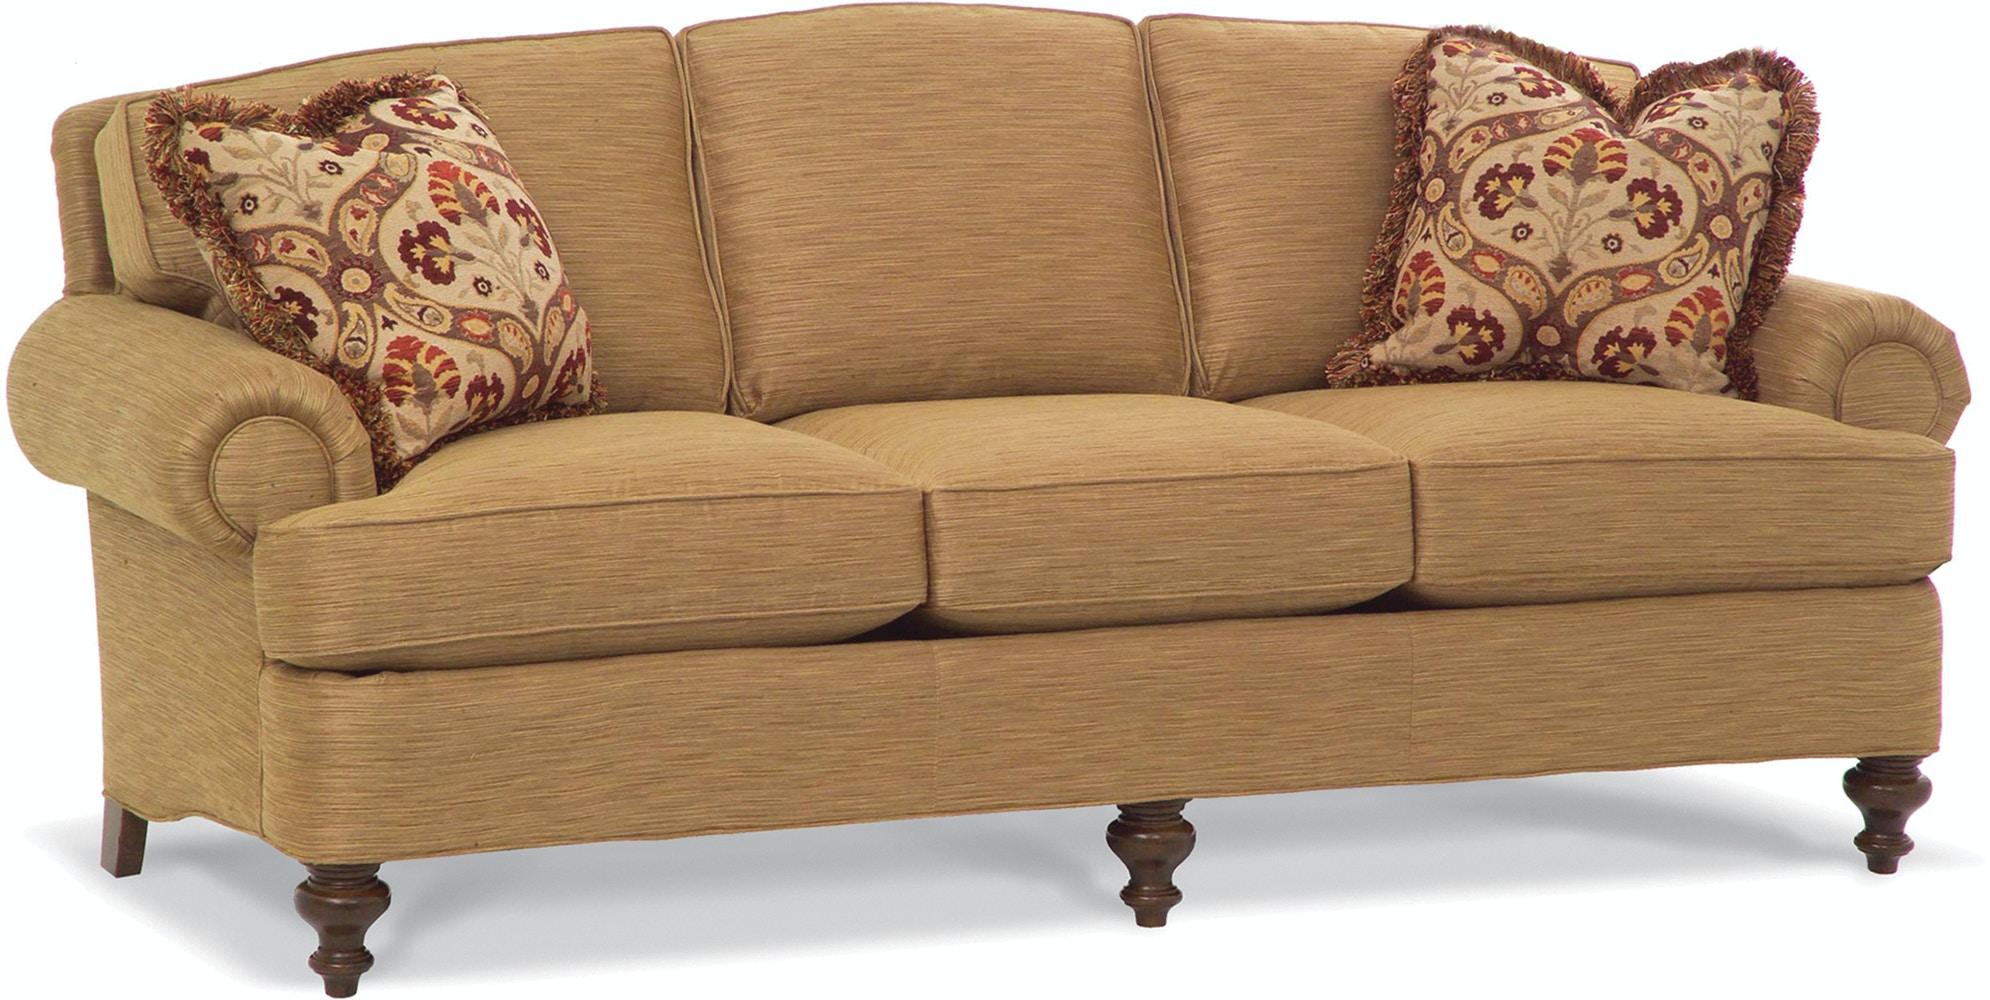 Taylor King Furniture K1803 Living Room Skyy Sofa